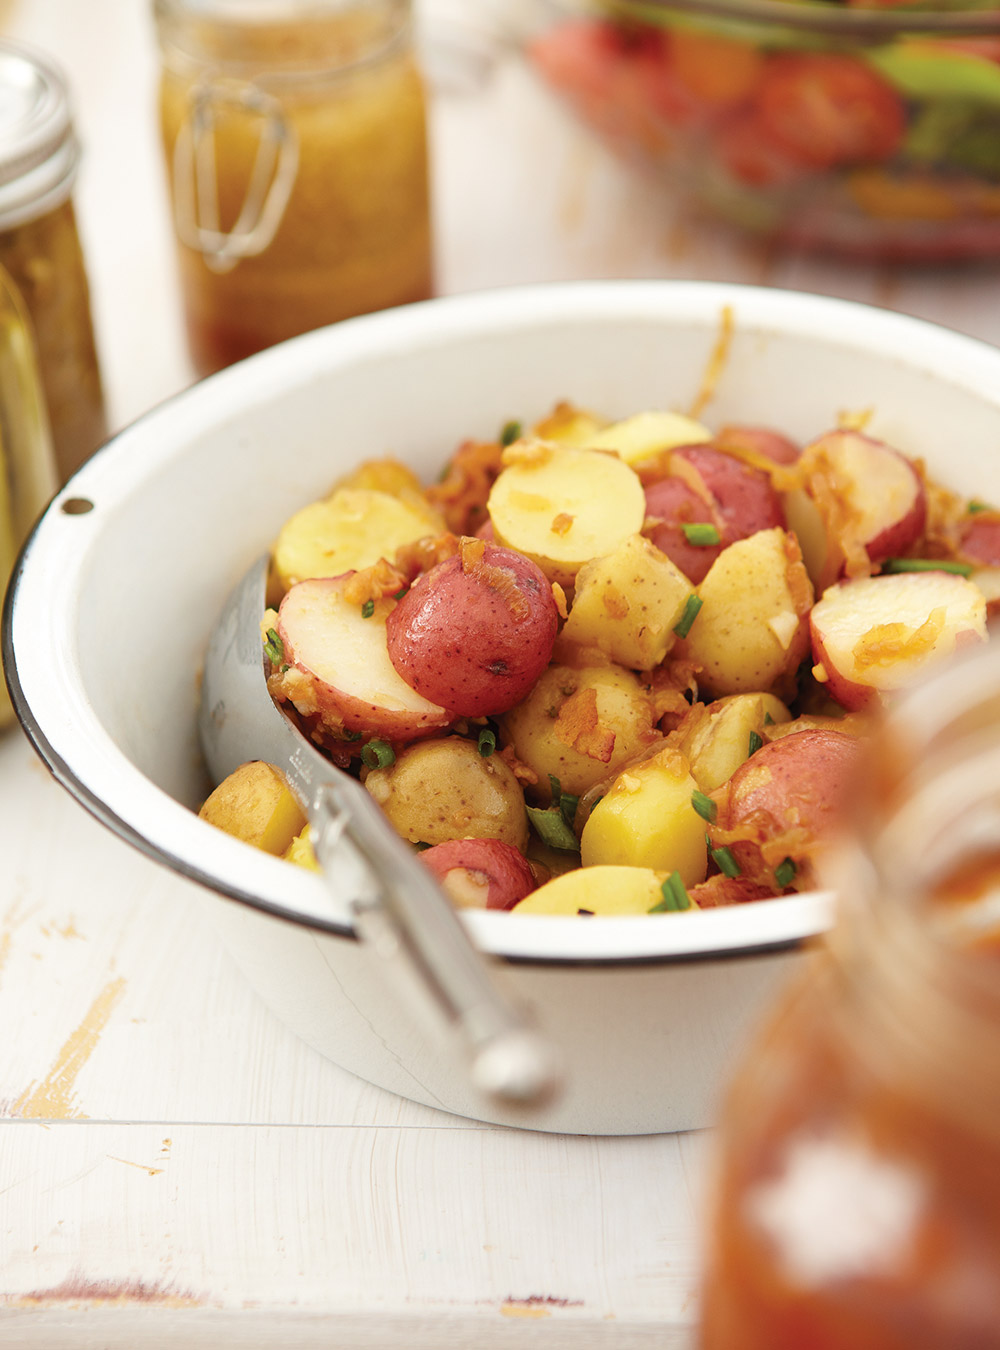 Salade de pommes de terre au bacon ricardo for Articles de cuisine de ricardo